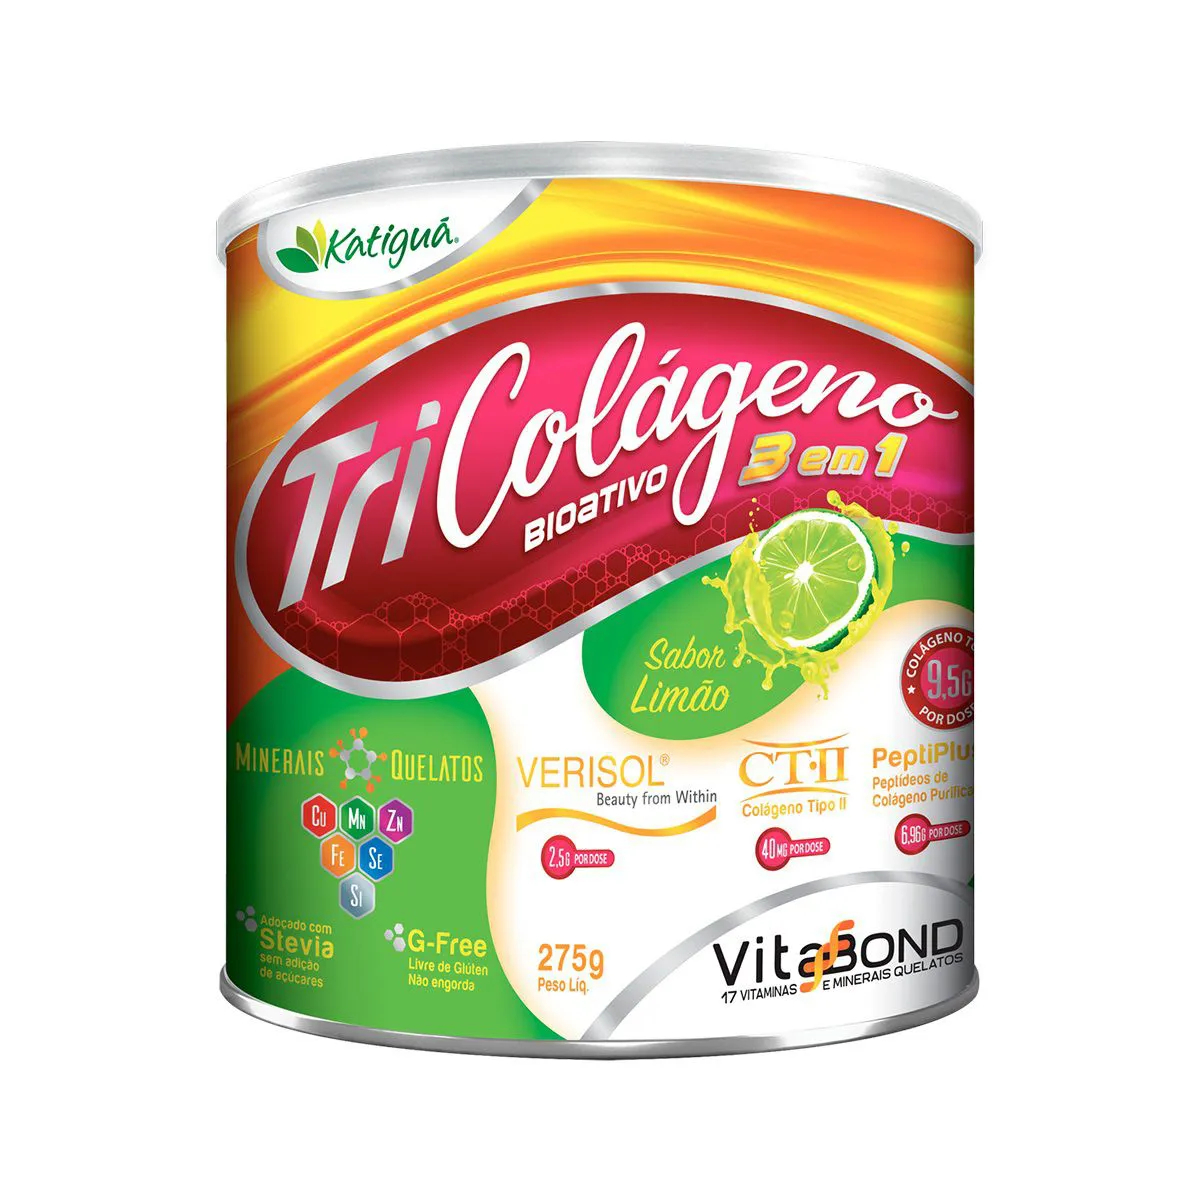 Suplemento Tri Colágeno Bioativo sabor Limão 275g - Katiguá